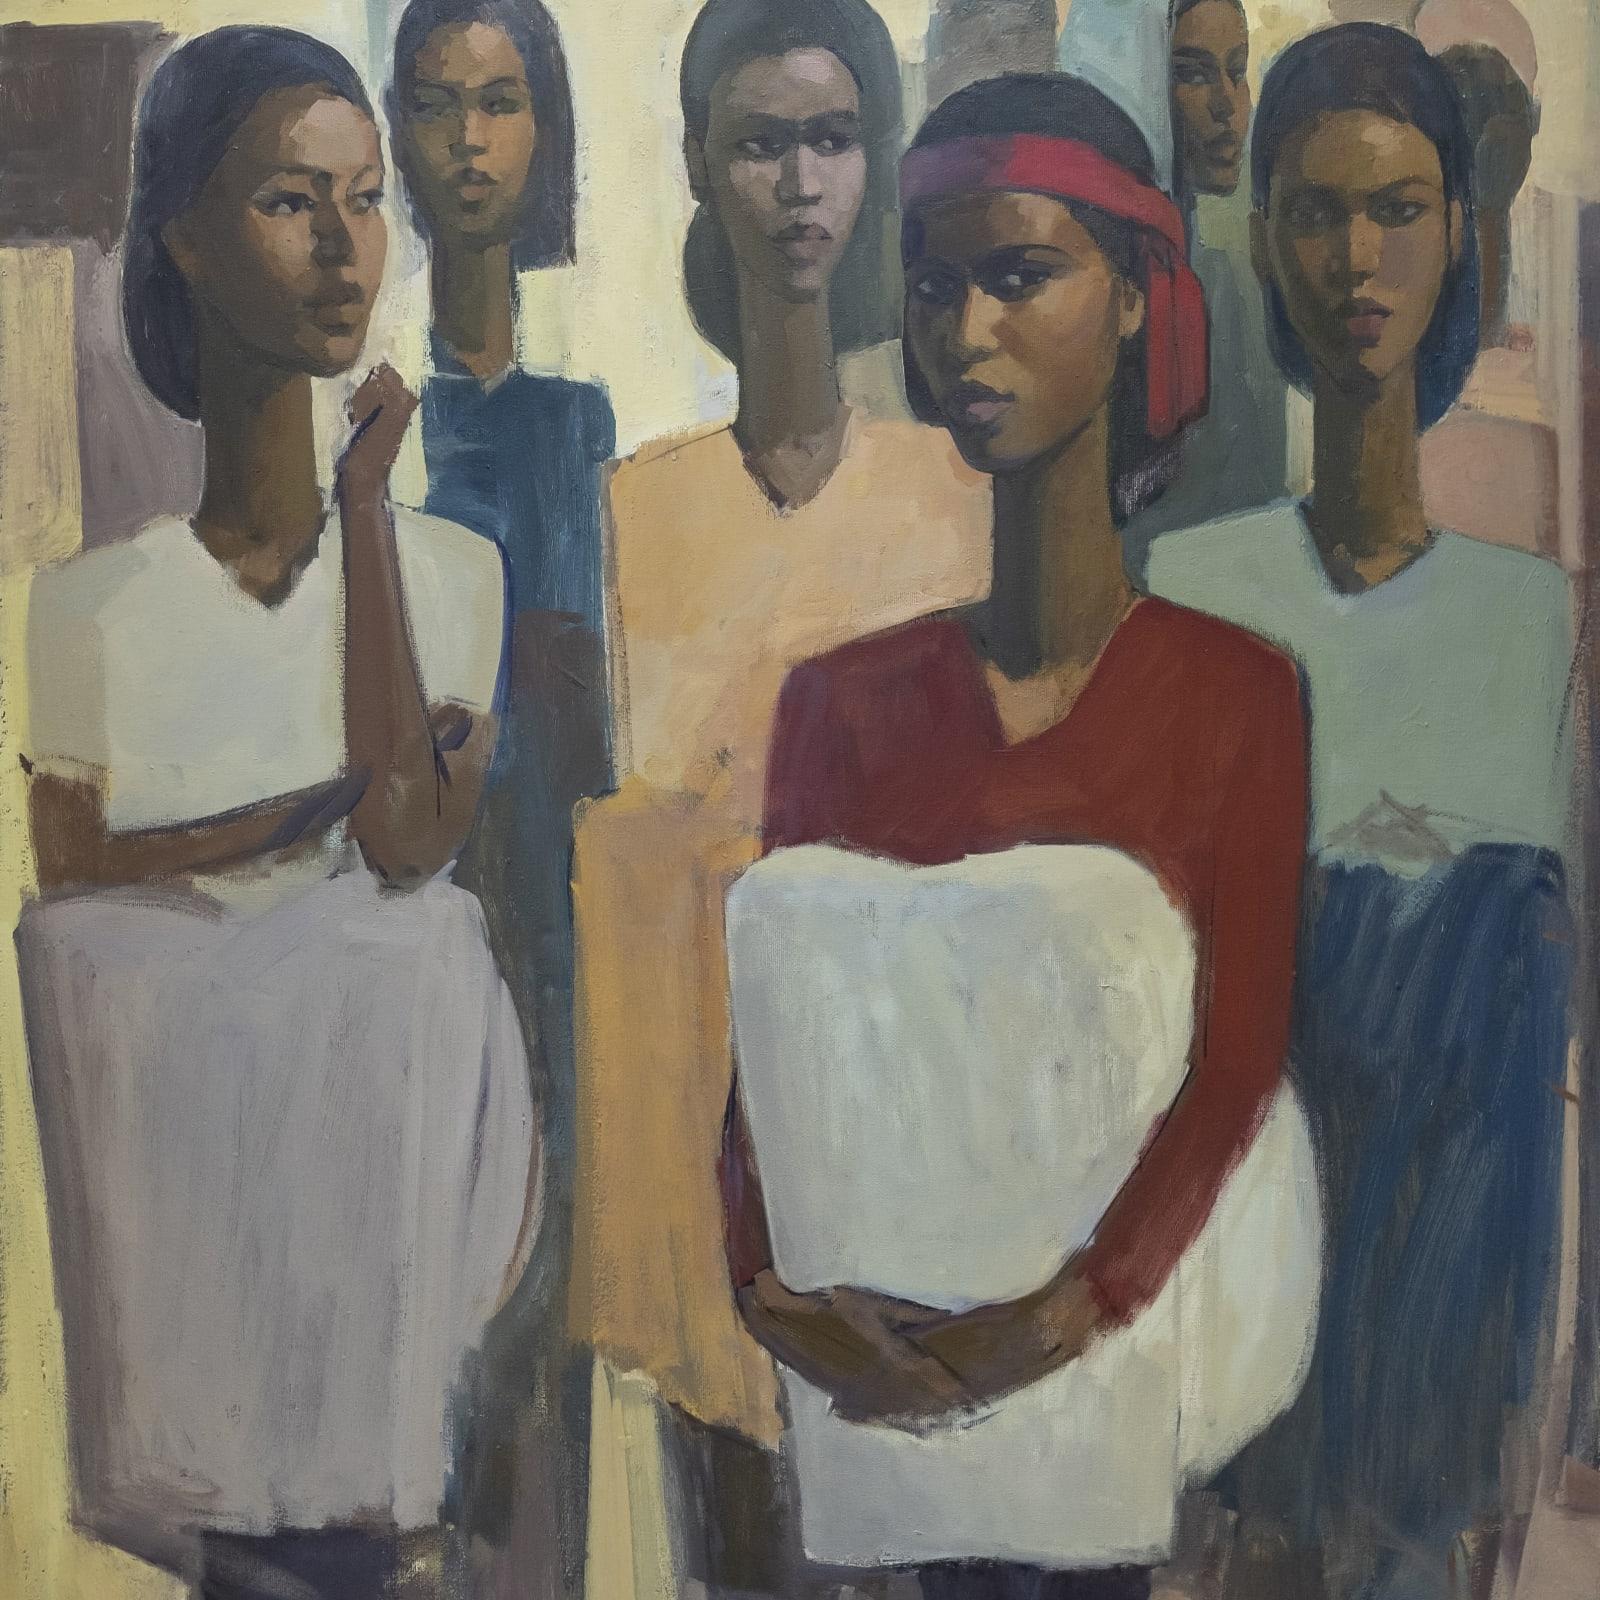 Tadesse Mesfin, Pillars of Life: Expectations II, 2020